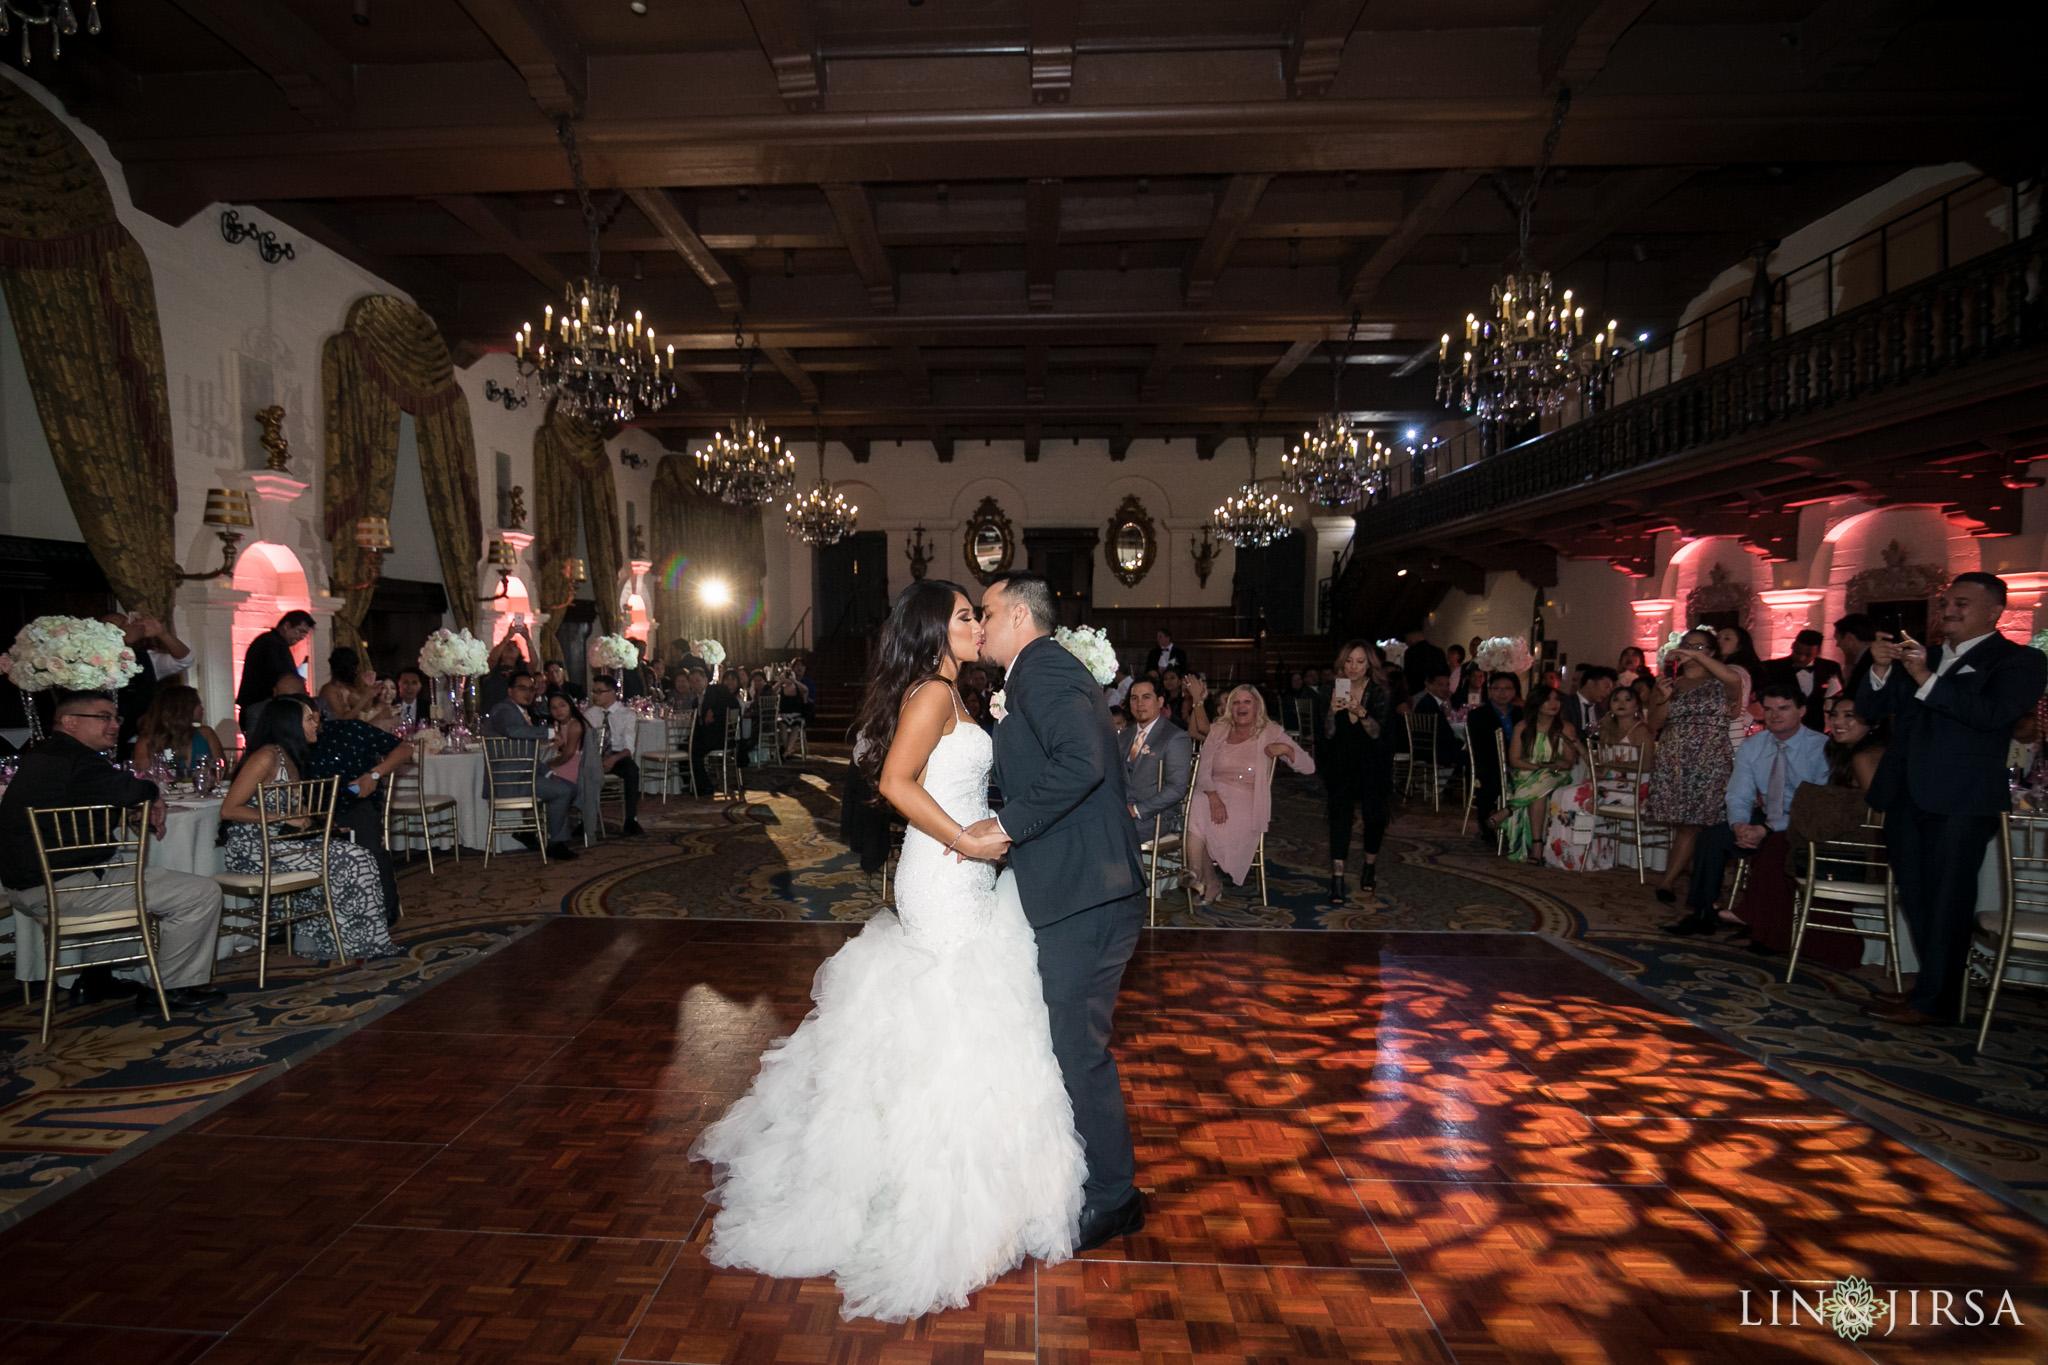 26-mission-inn-riverside-wedding-photography